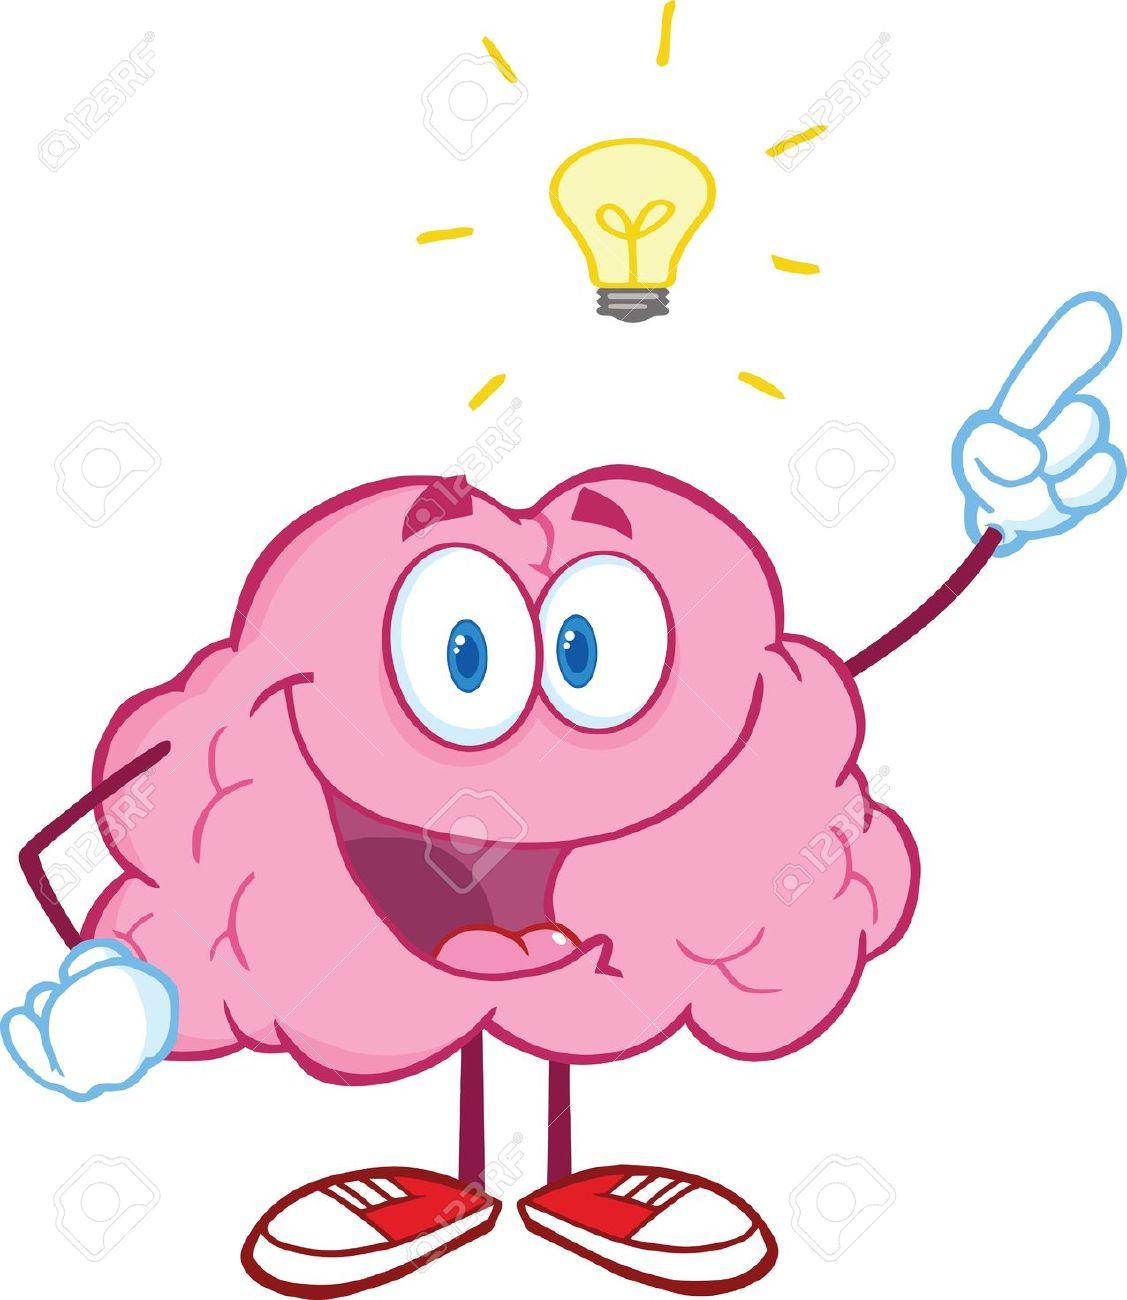 Color brain clipart clip freeuse download Brain clipart happy brain pencil and in color brain - Clipartable.com clip freeuse download